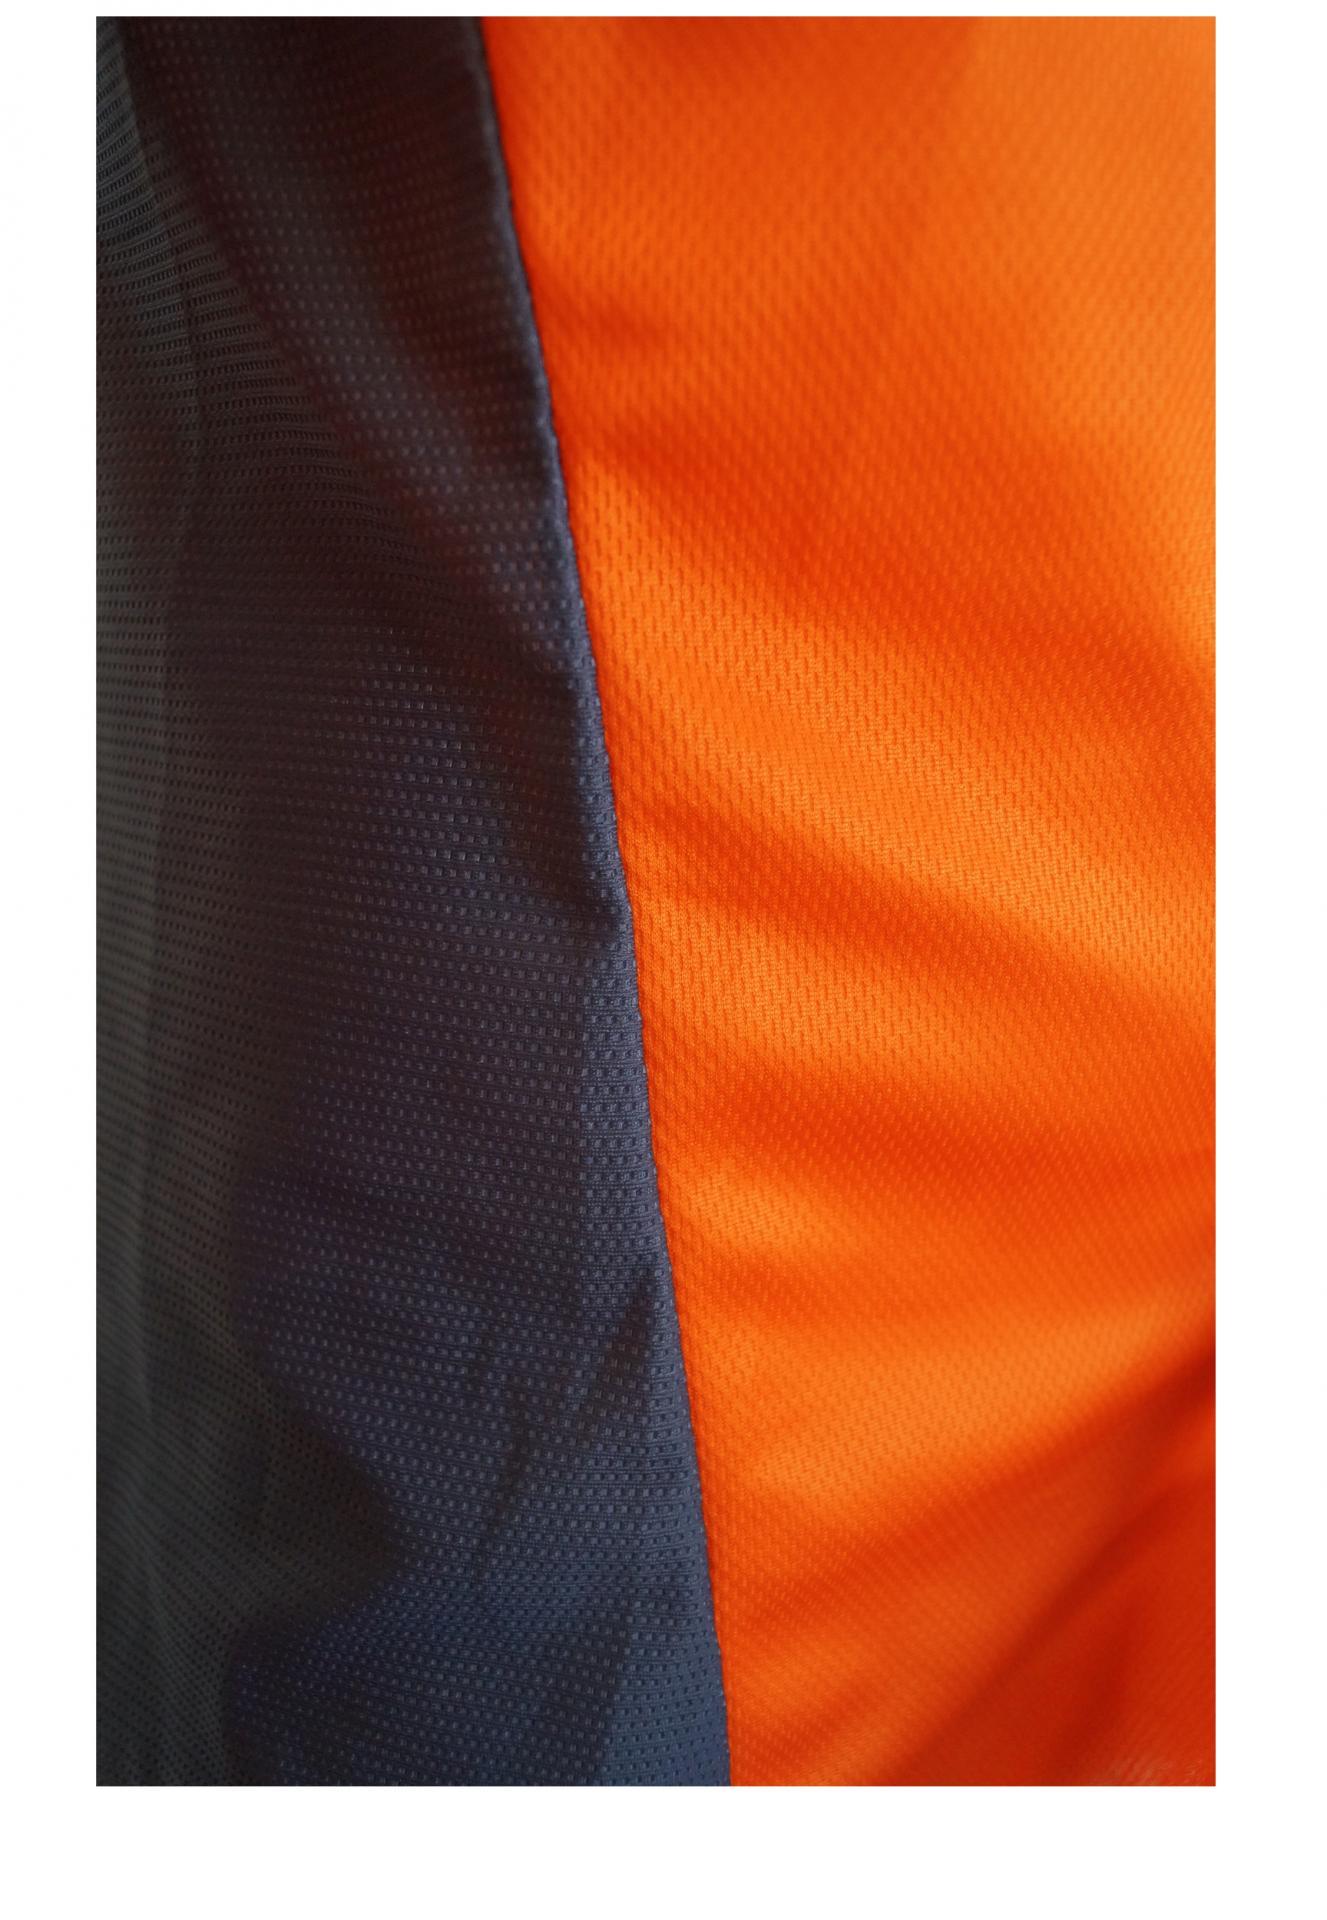 Maillot orange cote